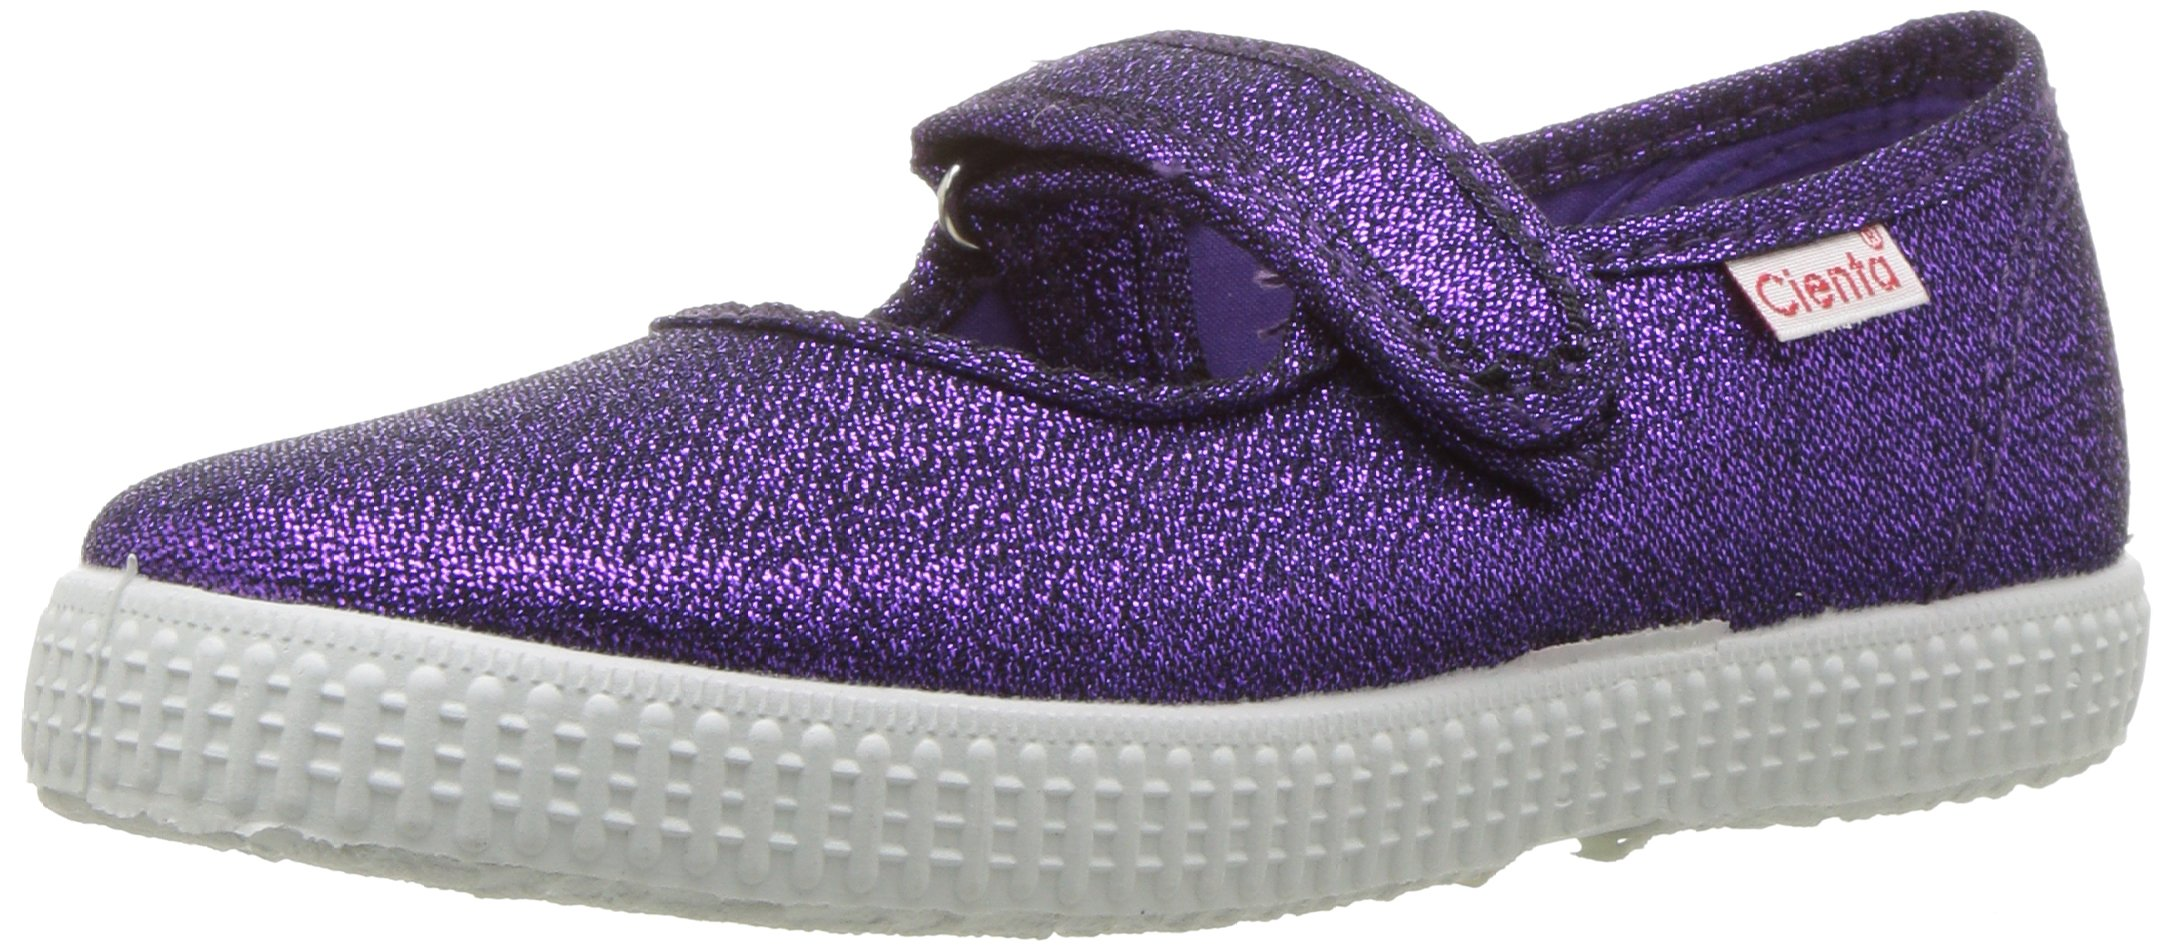 Cienta 56013 Glitter Mary Jane Fashion Sneaker,Purple,23 EU (6.5 M US Toddler)